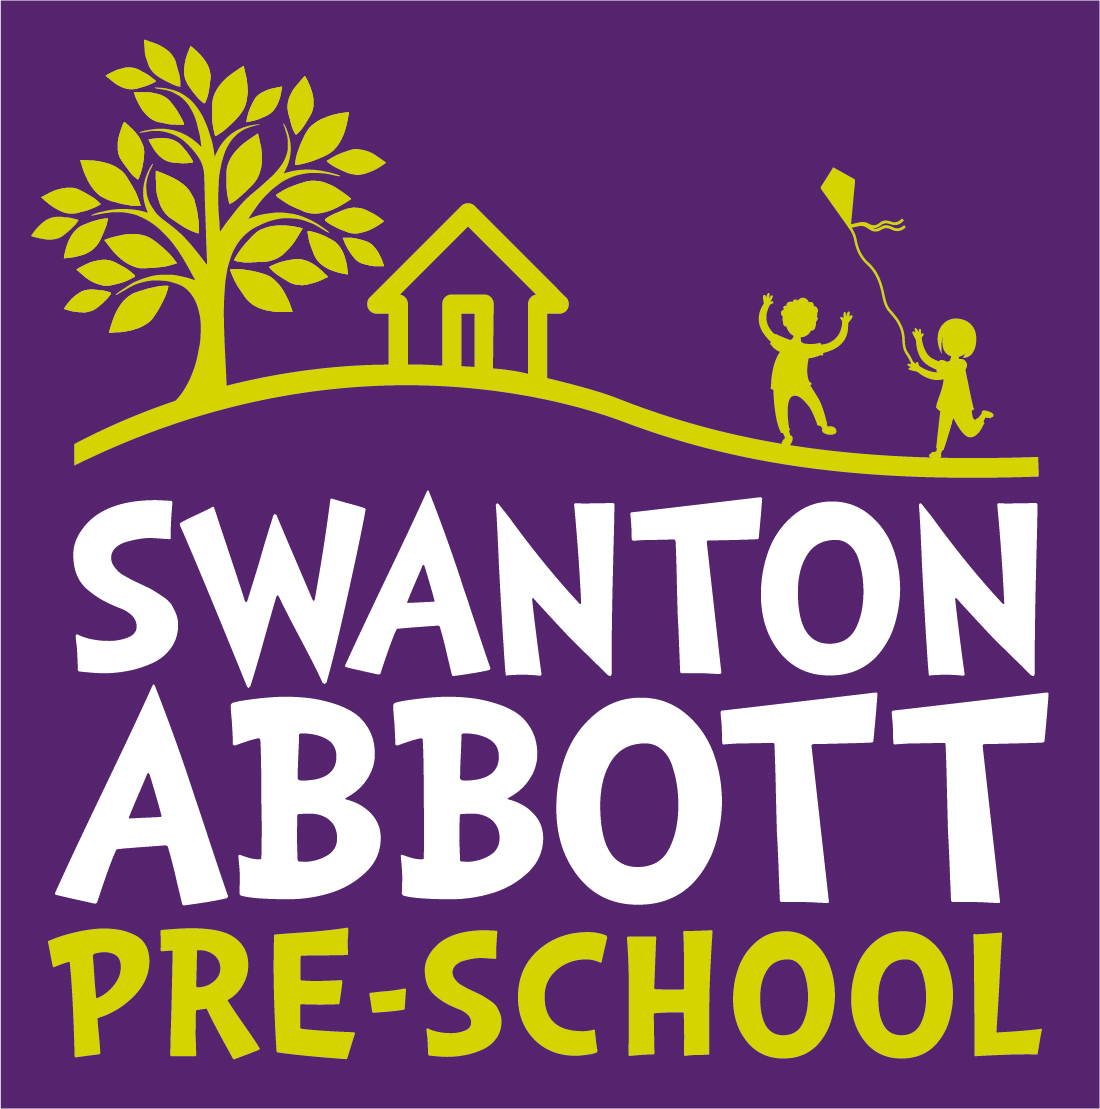 Swanton Abbott Pre-School